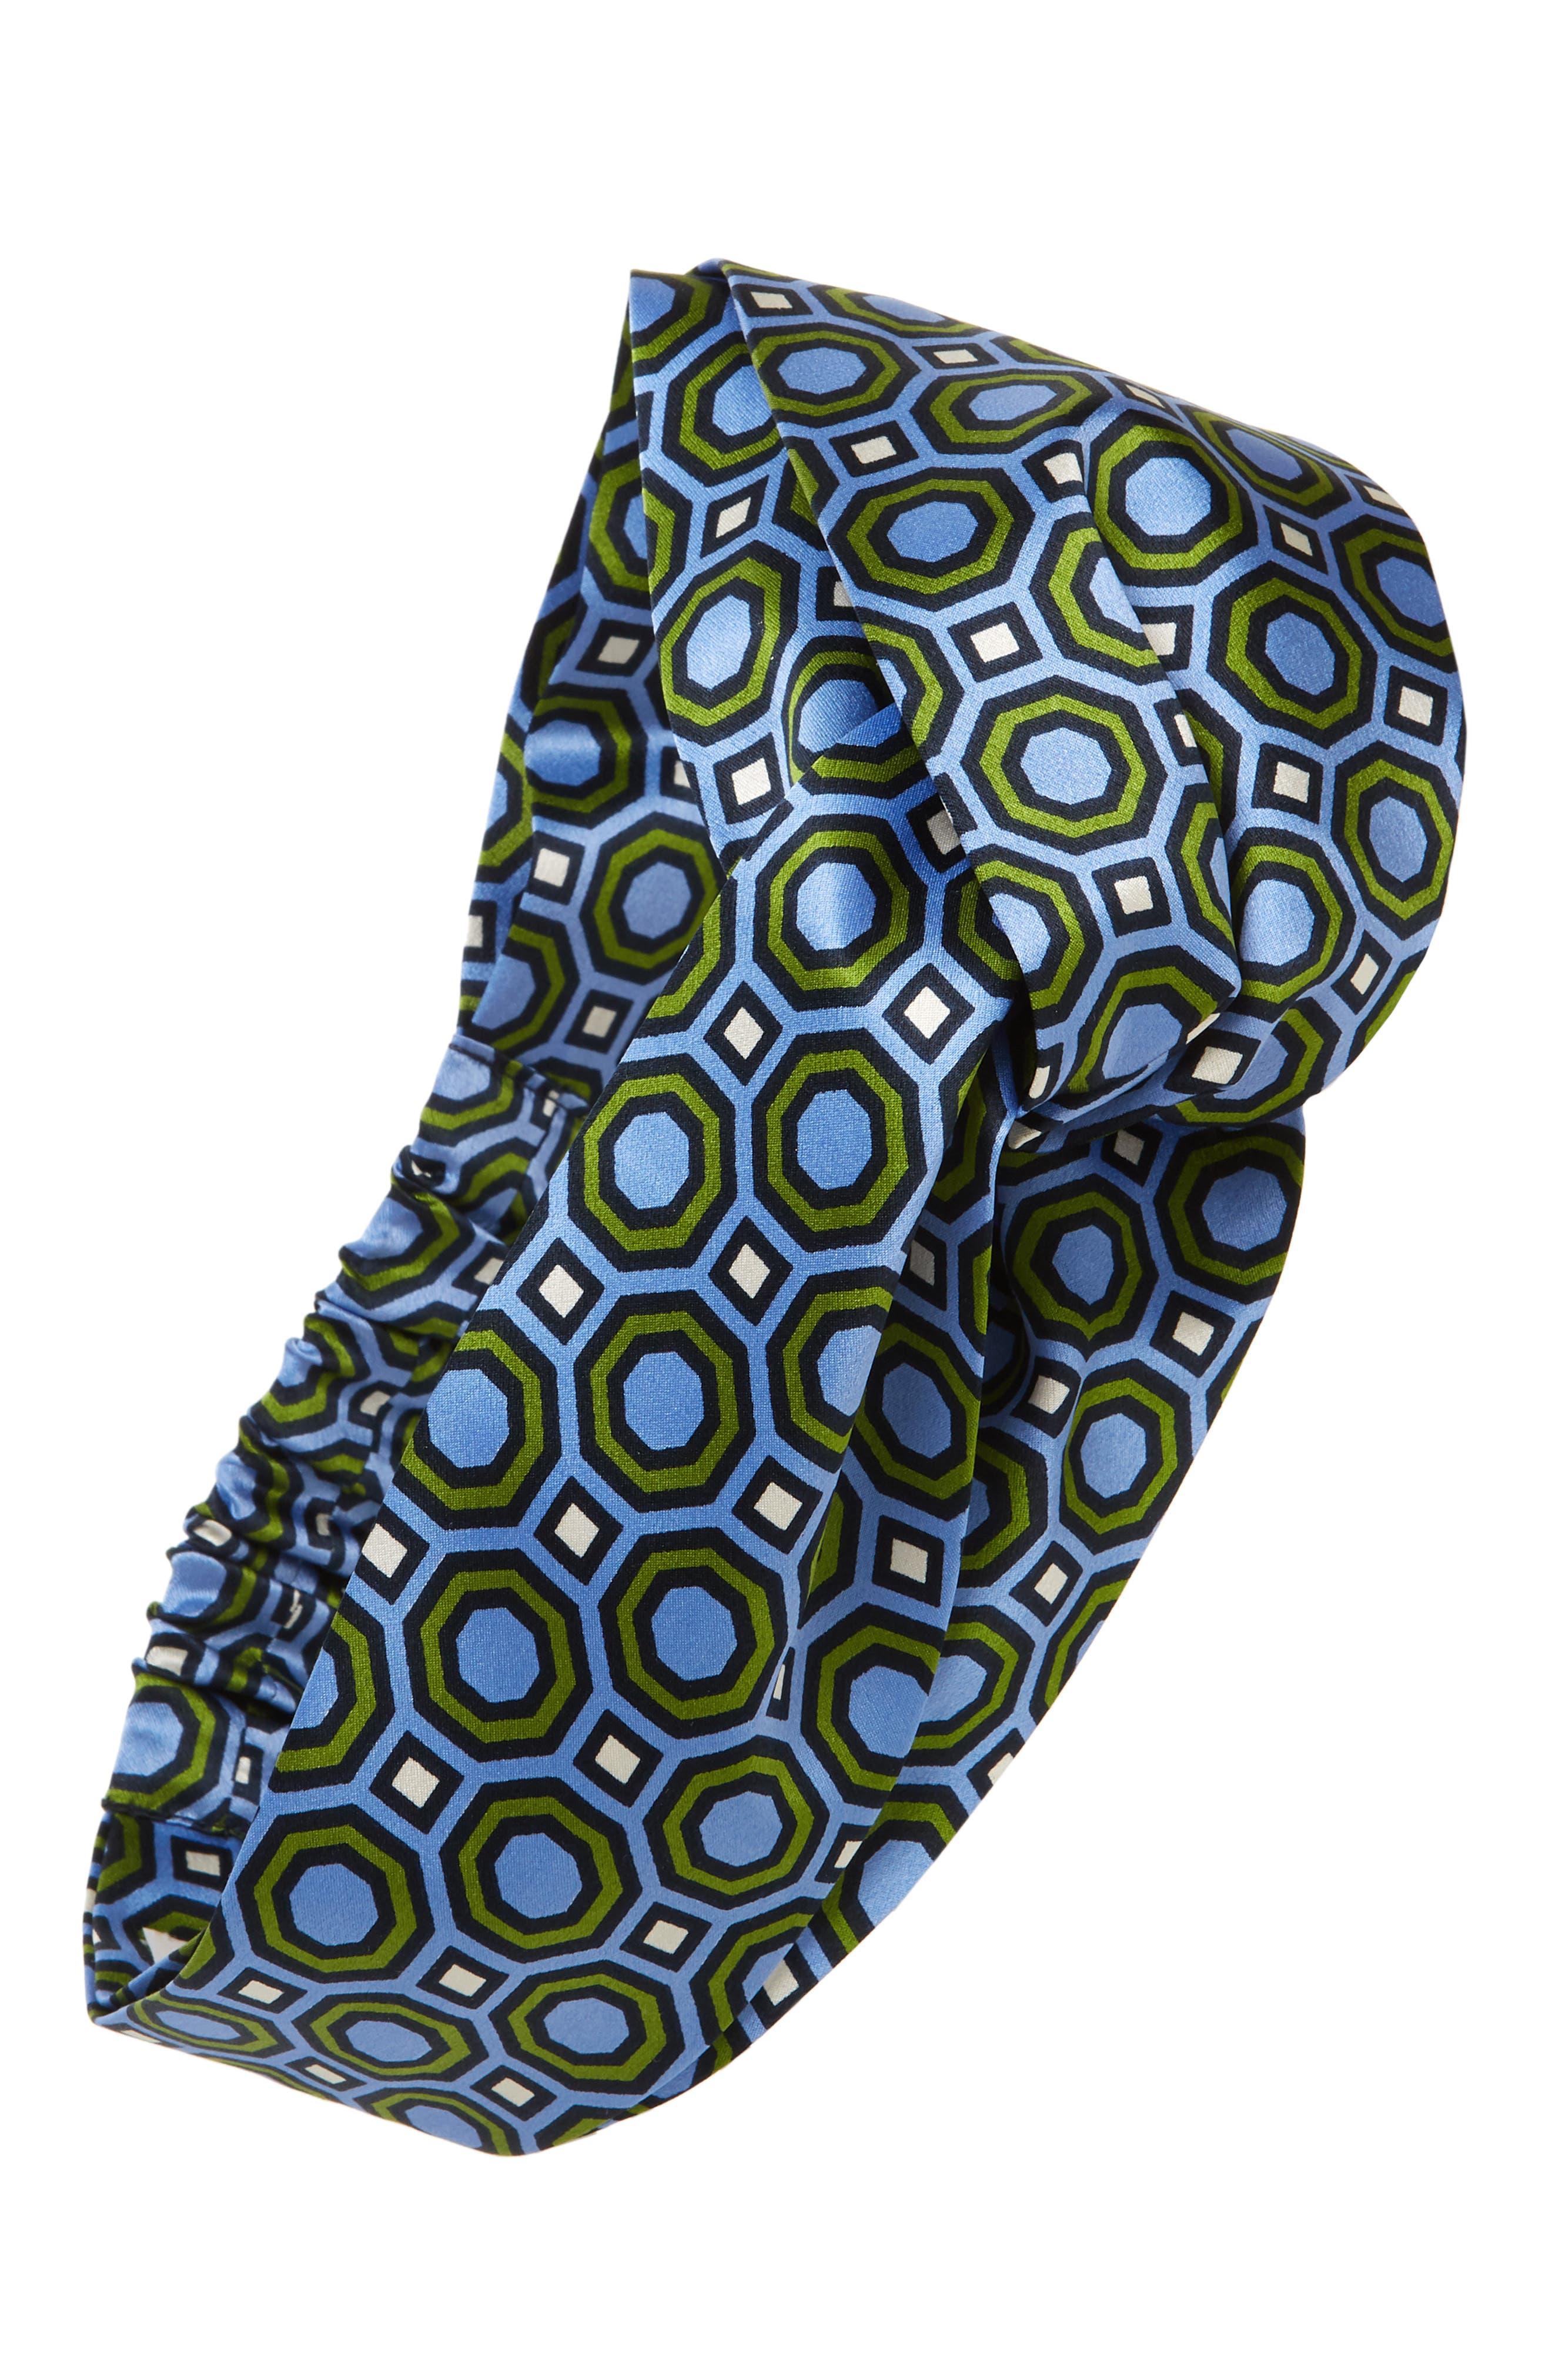 Alternate Image 1 Selected - Tory Burch Octagon Silk Headband